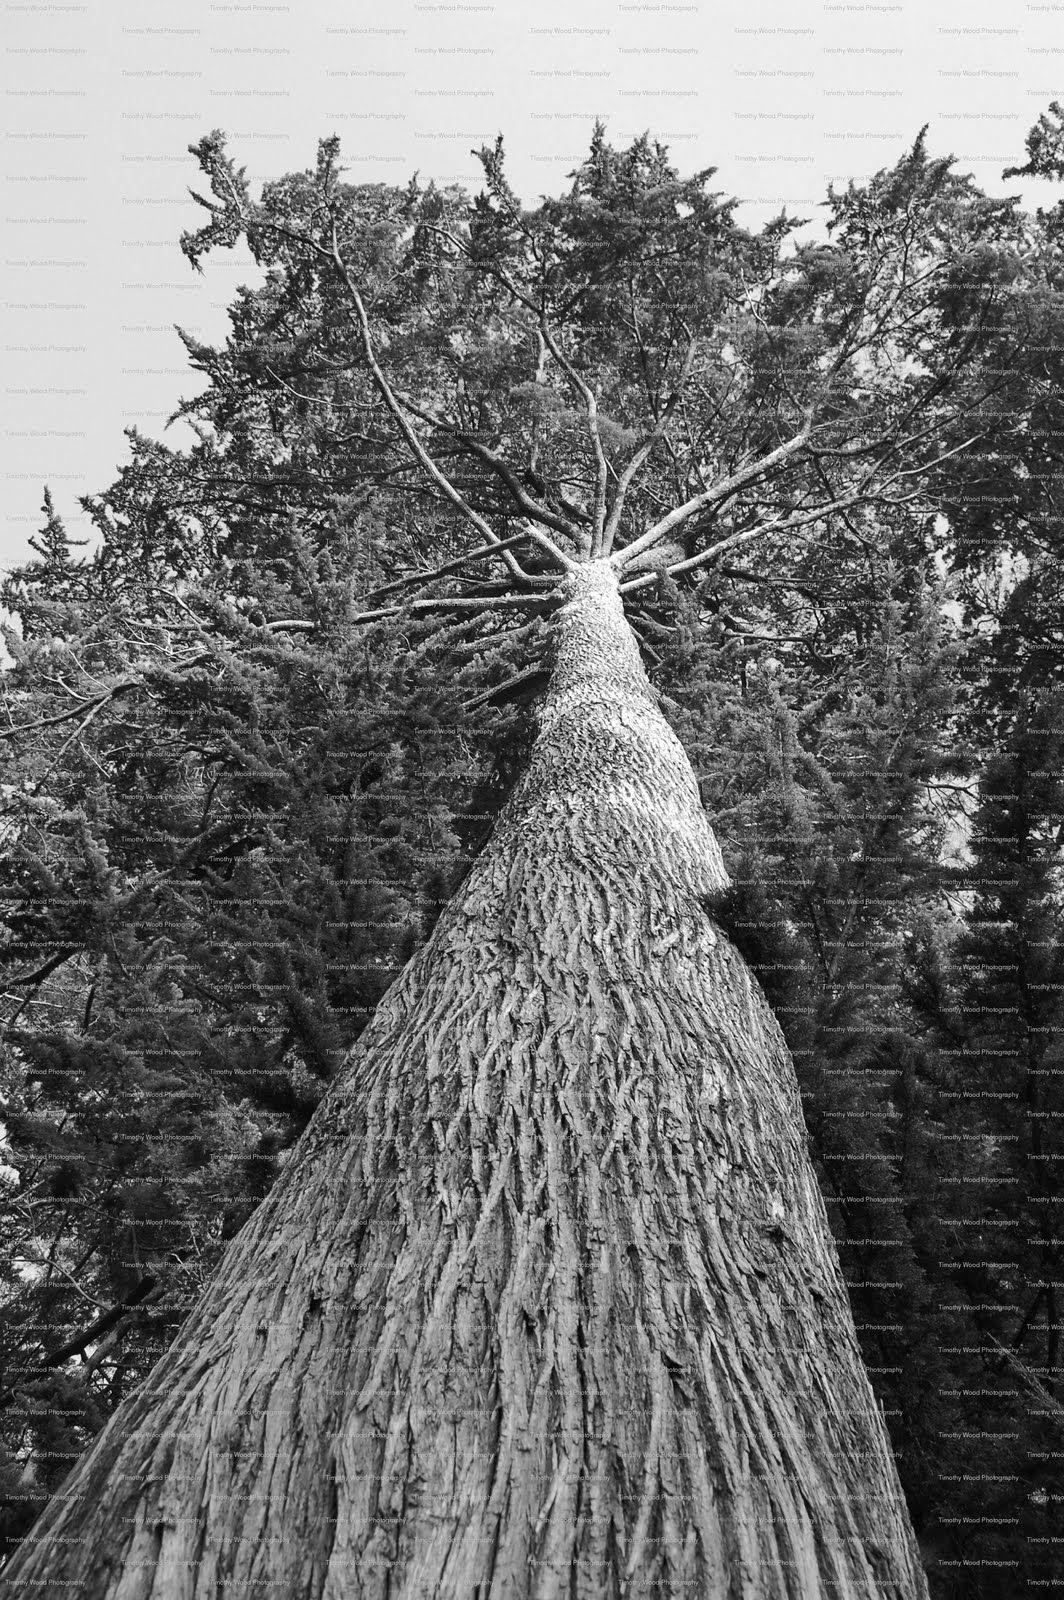 Ansel Adams Nature Photography Nature Photography Trees Ansel Adams Landscape Photography